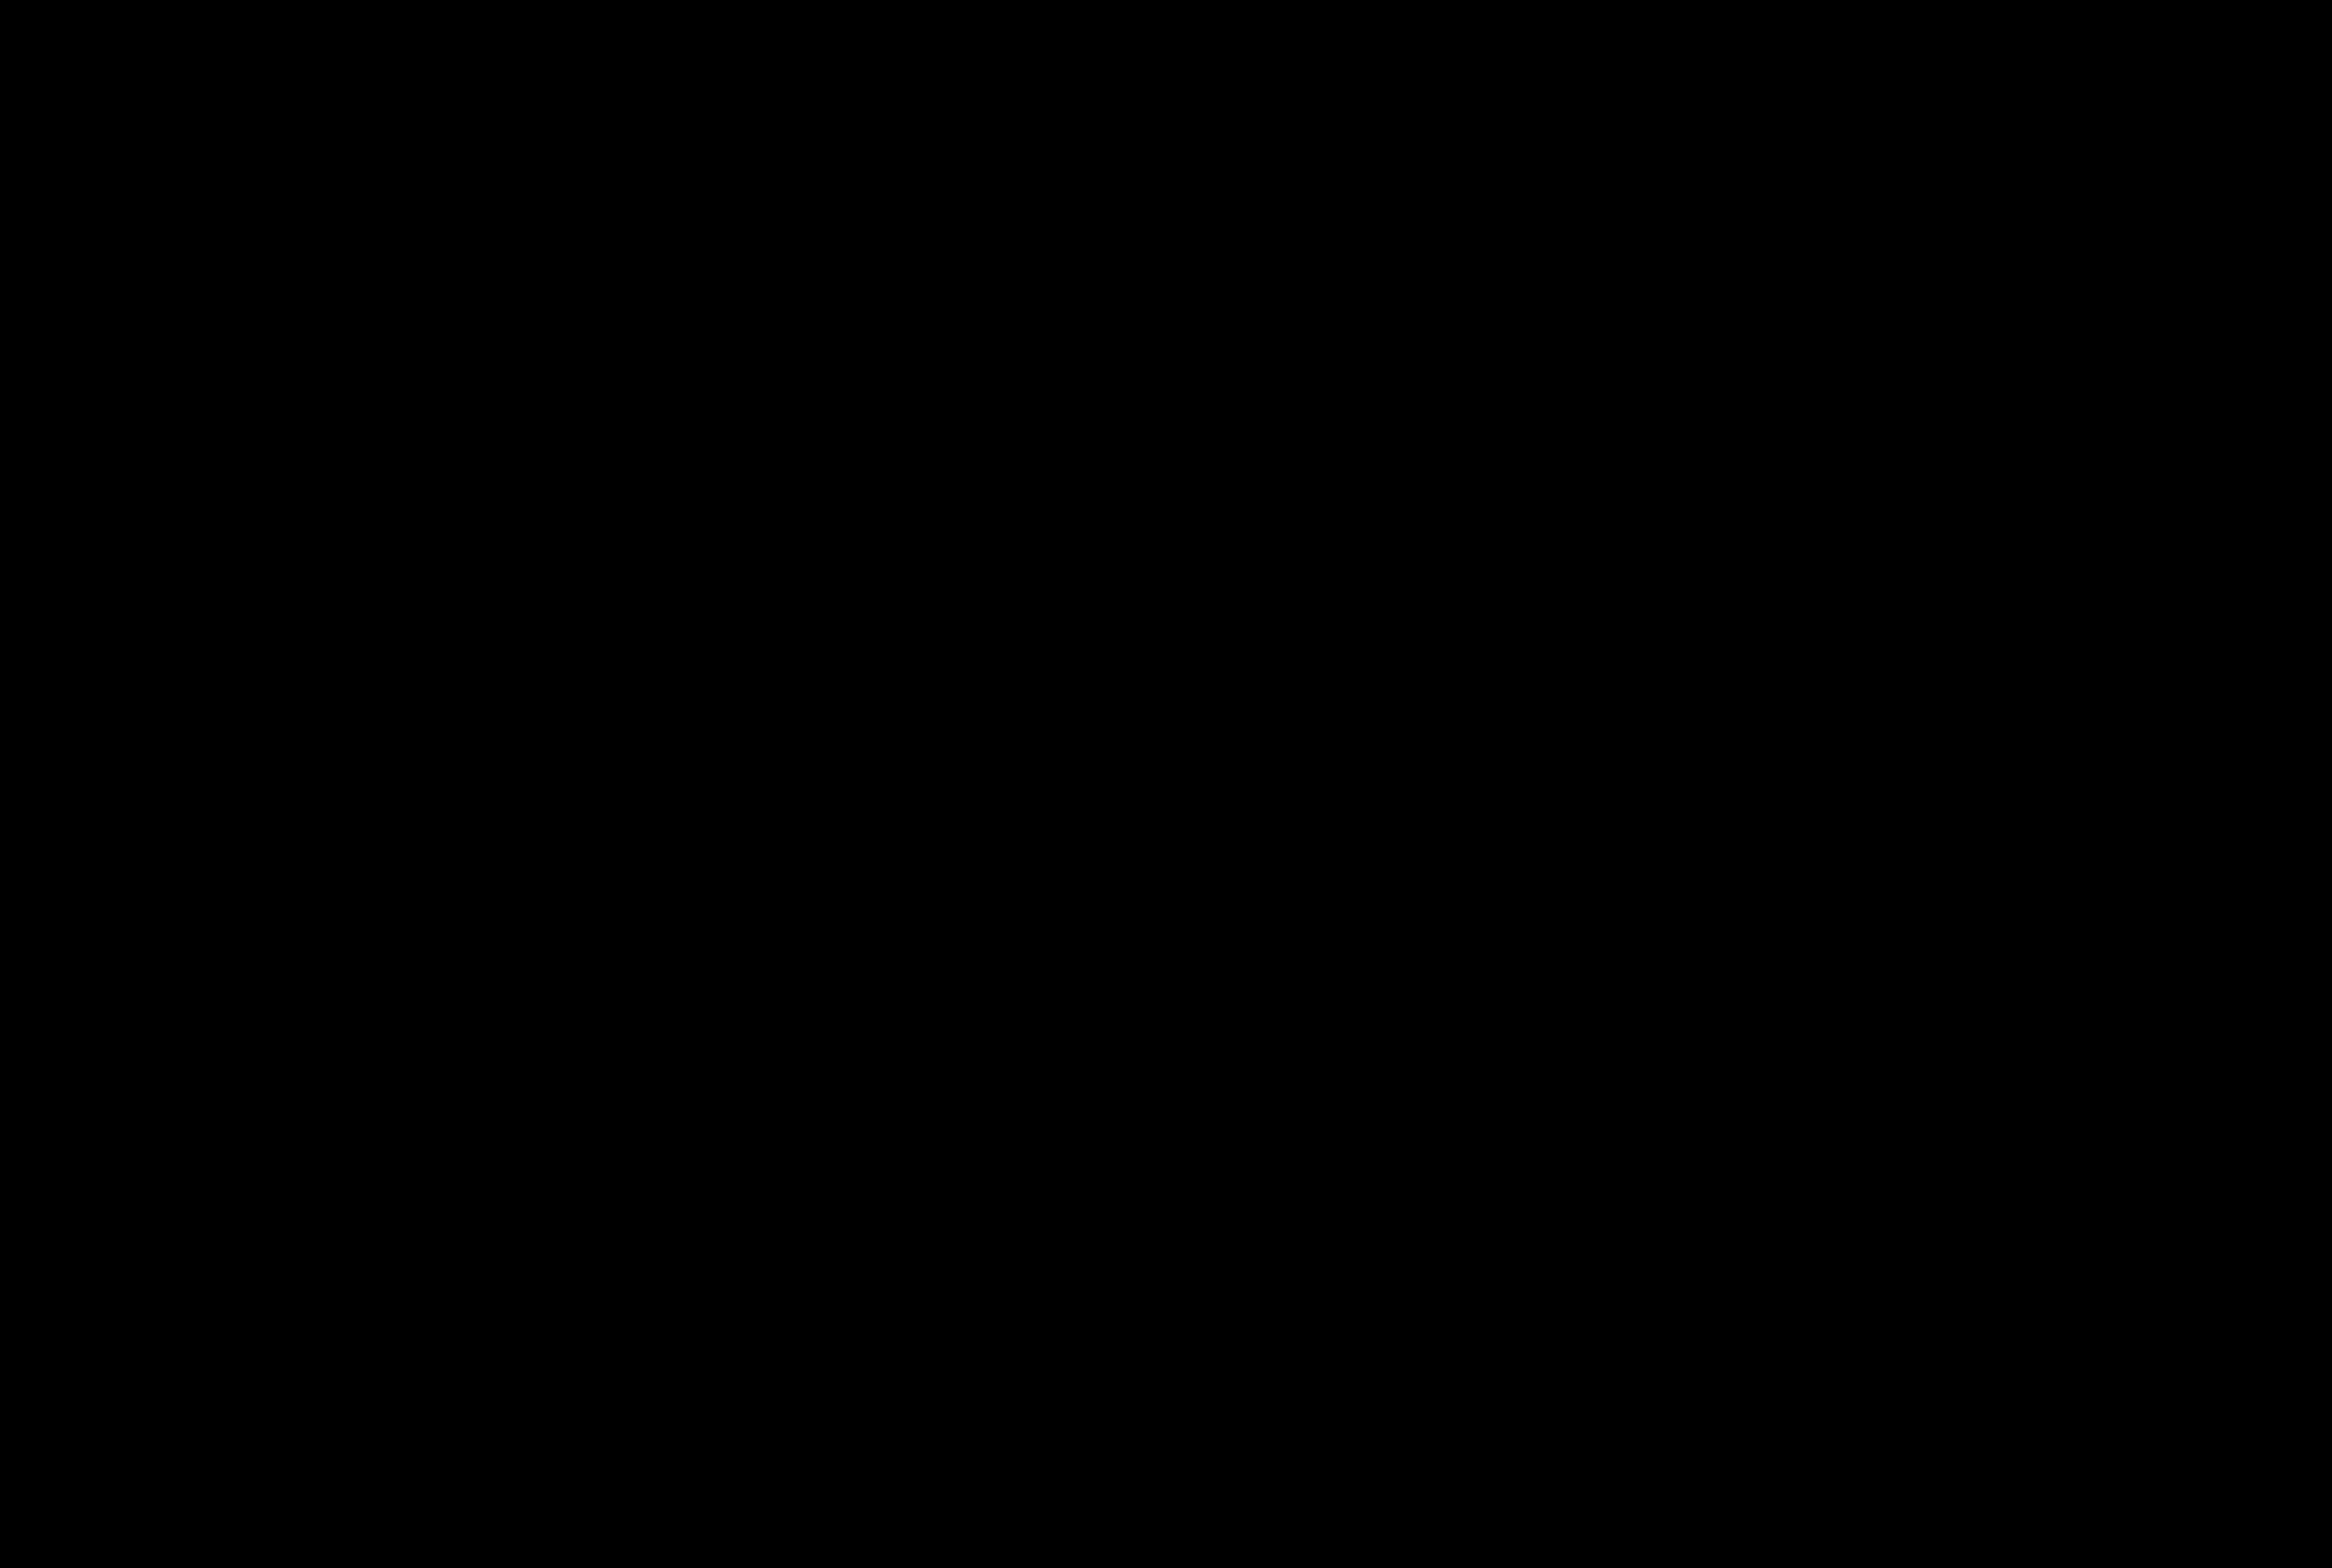 5381x3618 Black Butterfly Silhouette